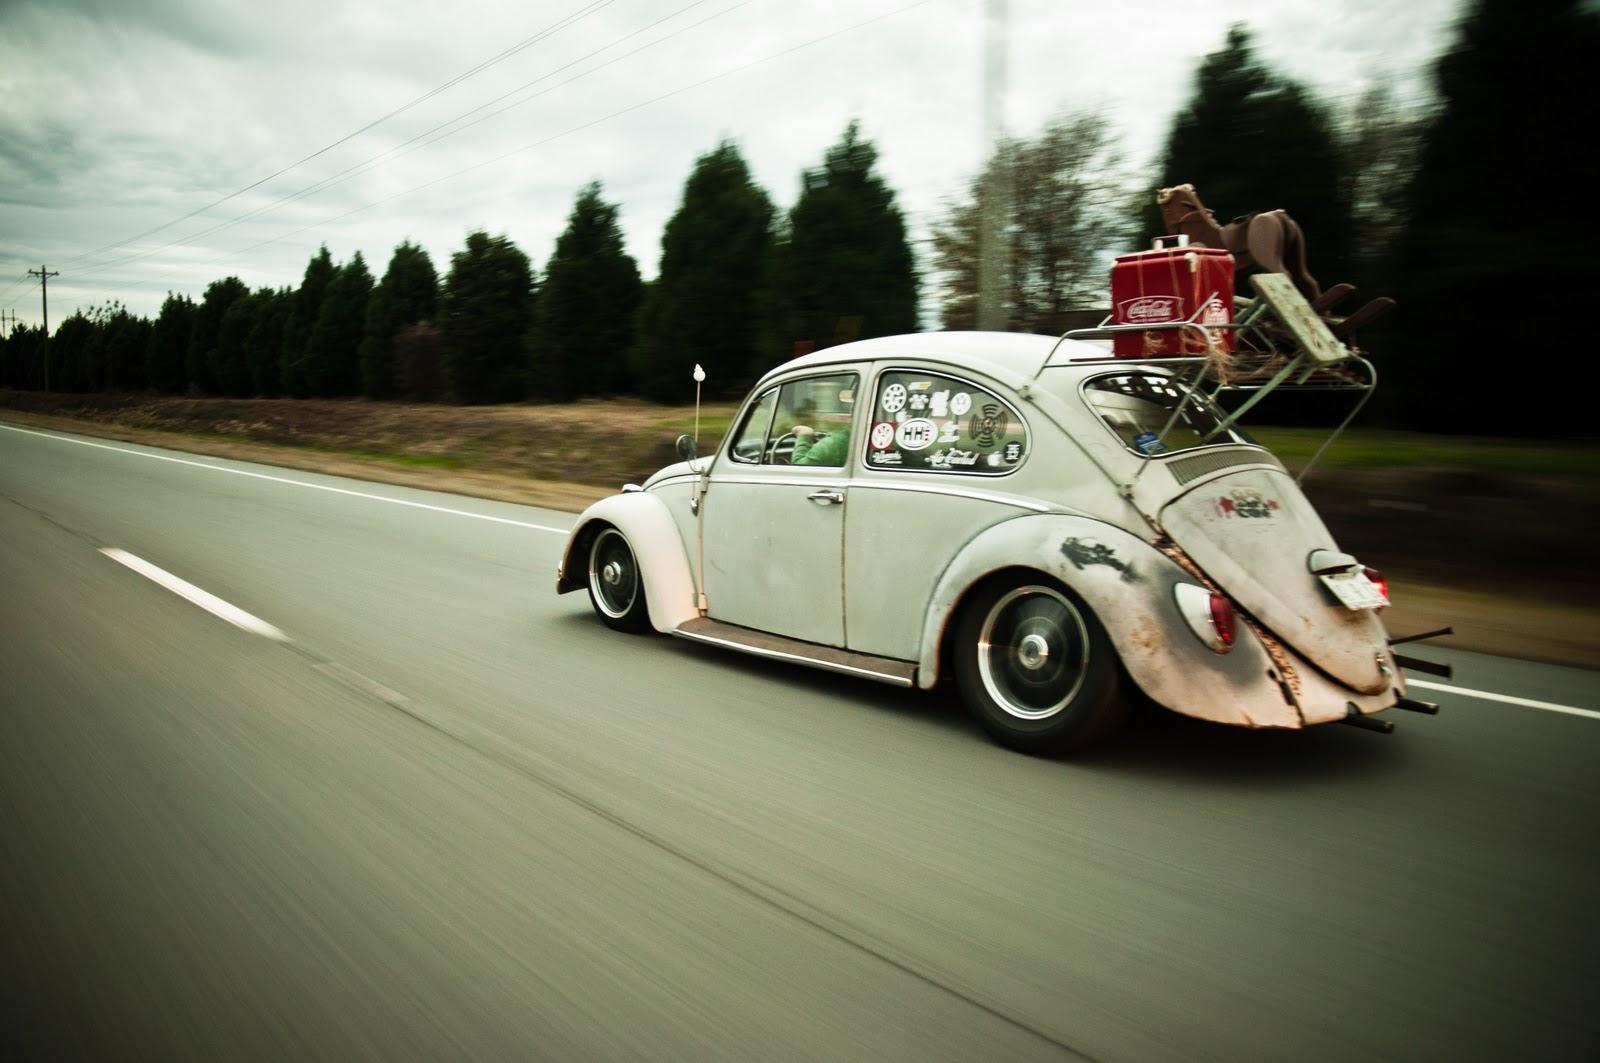 Otis - my '65 Beetle DSC_0039